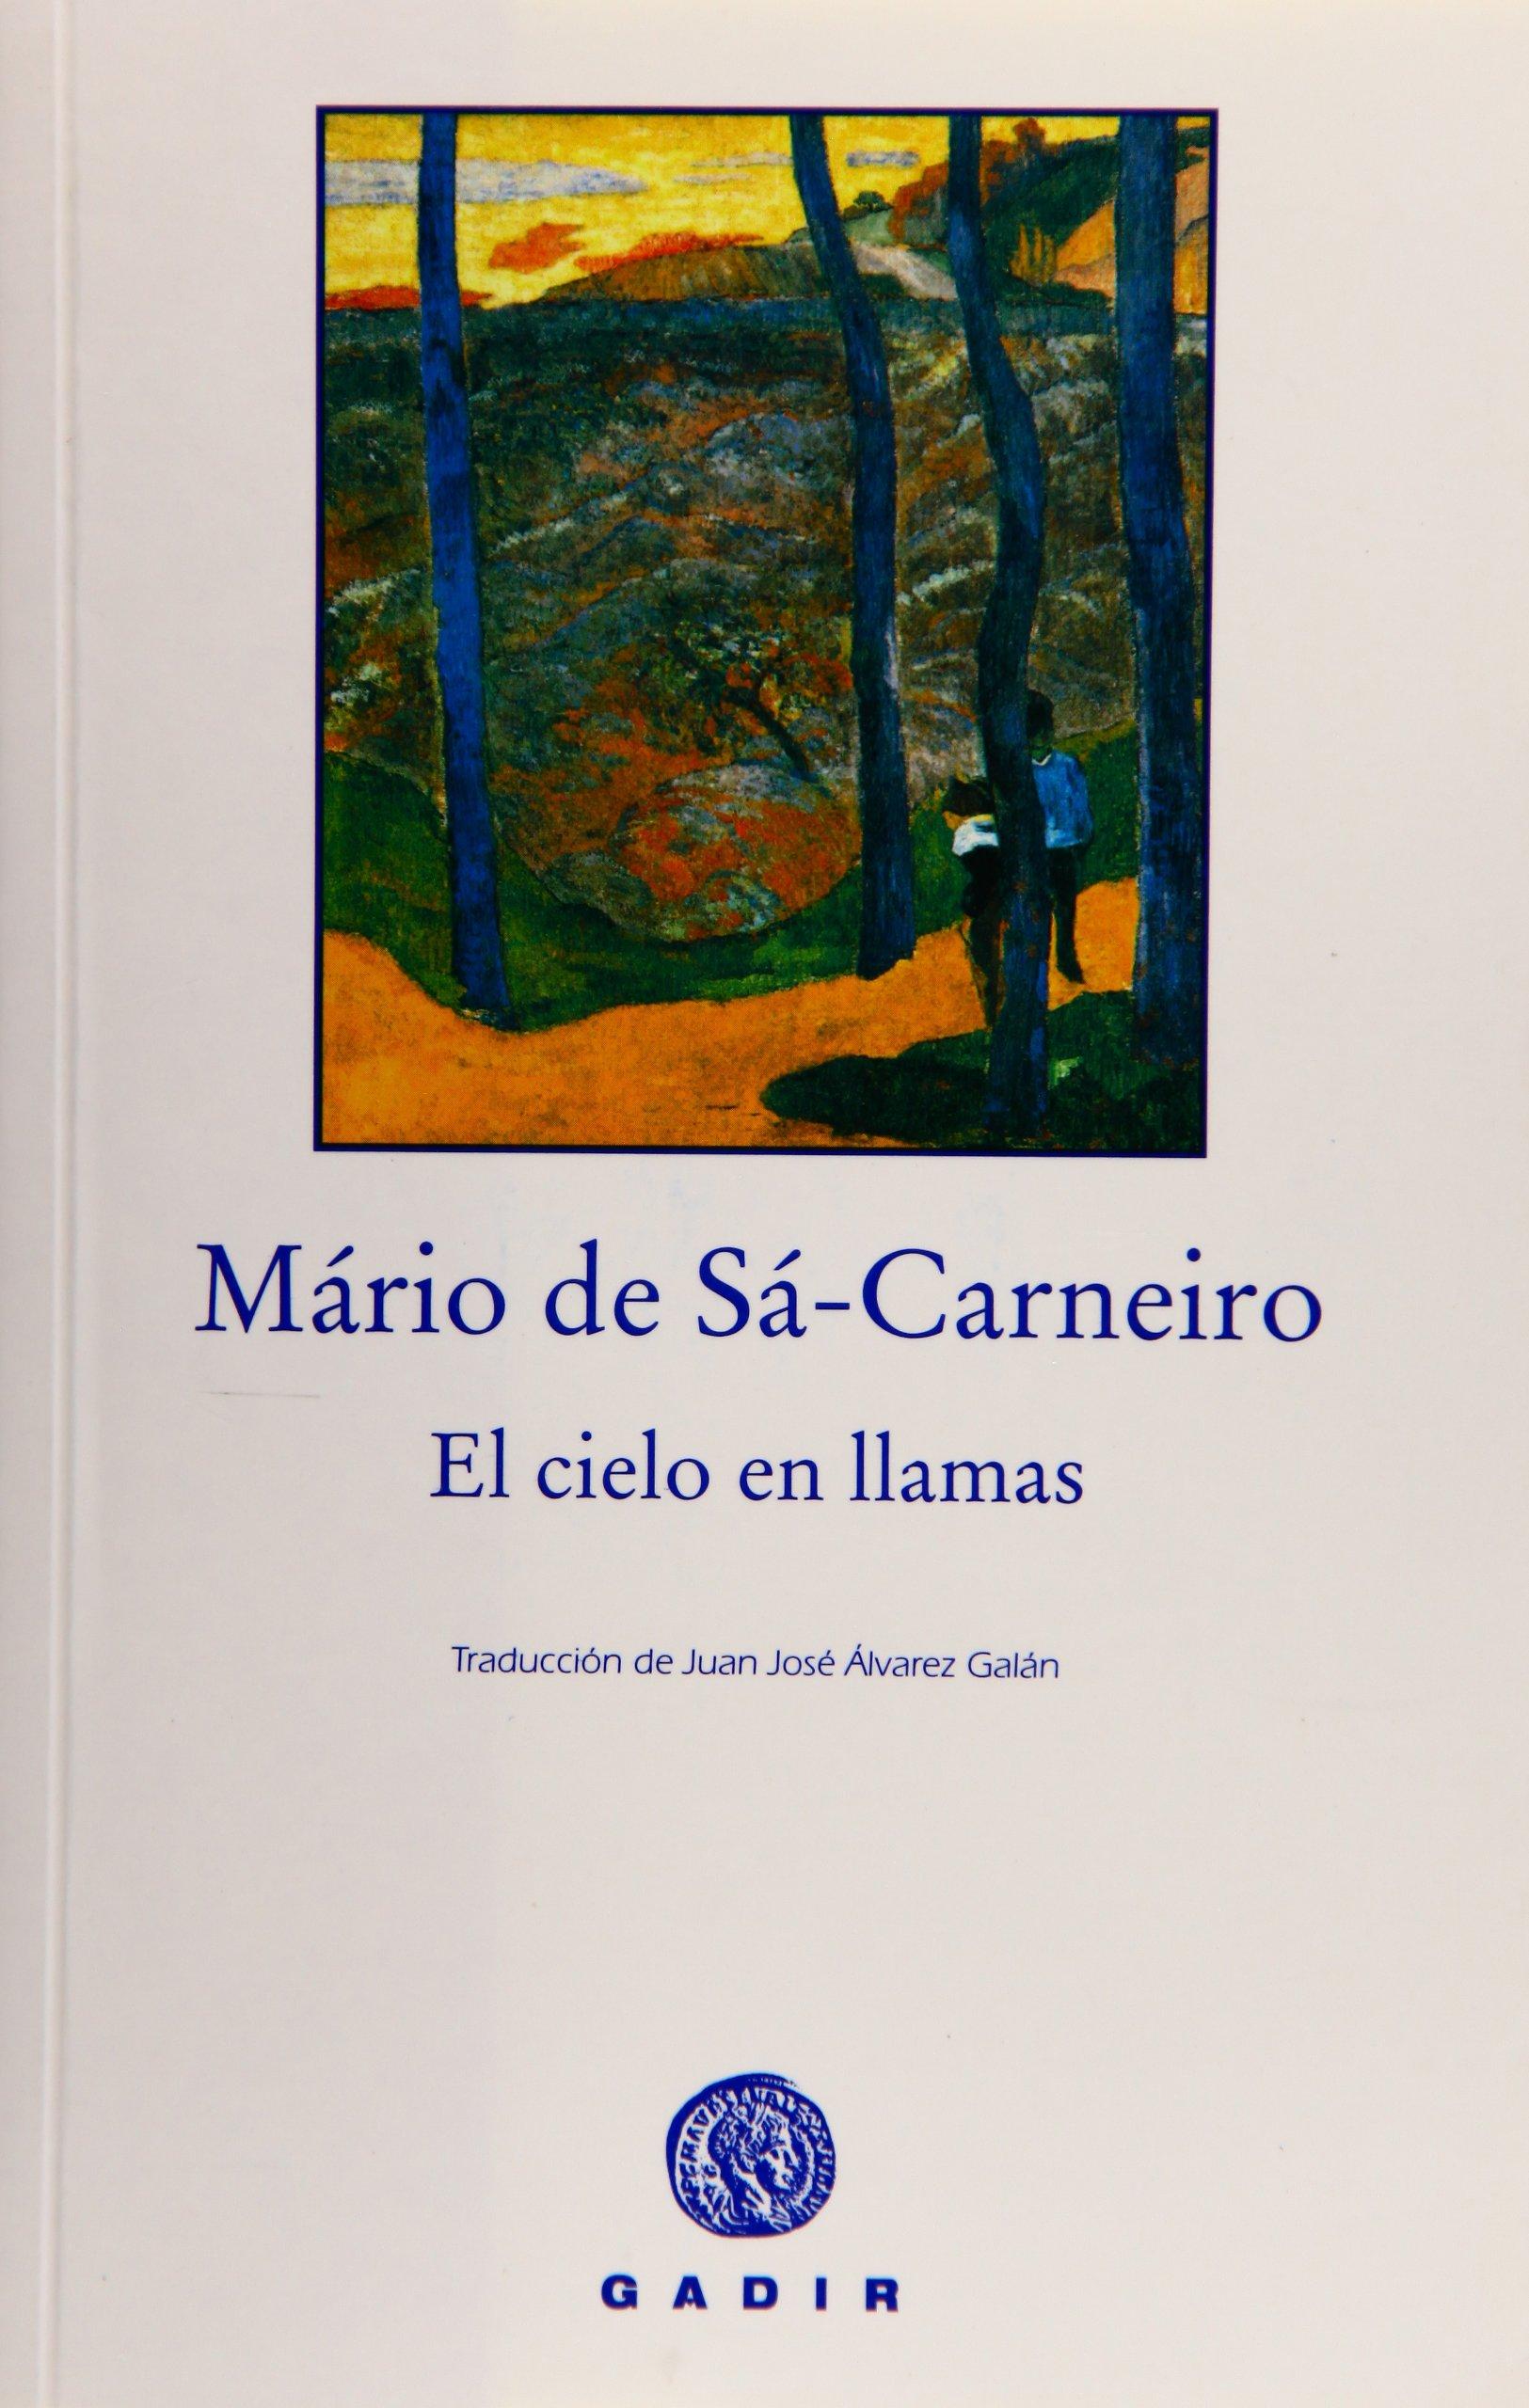 El cielo en llamas (Spanish Edition) (Spanish) Paperback – February 23, 2007